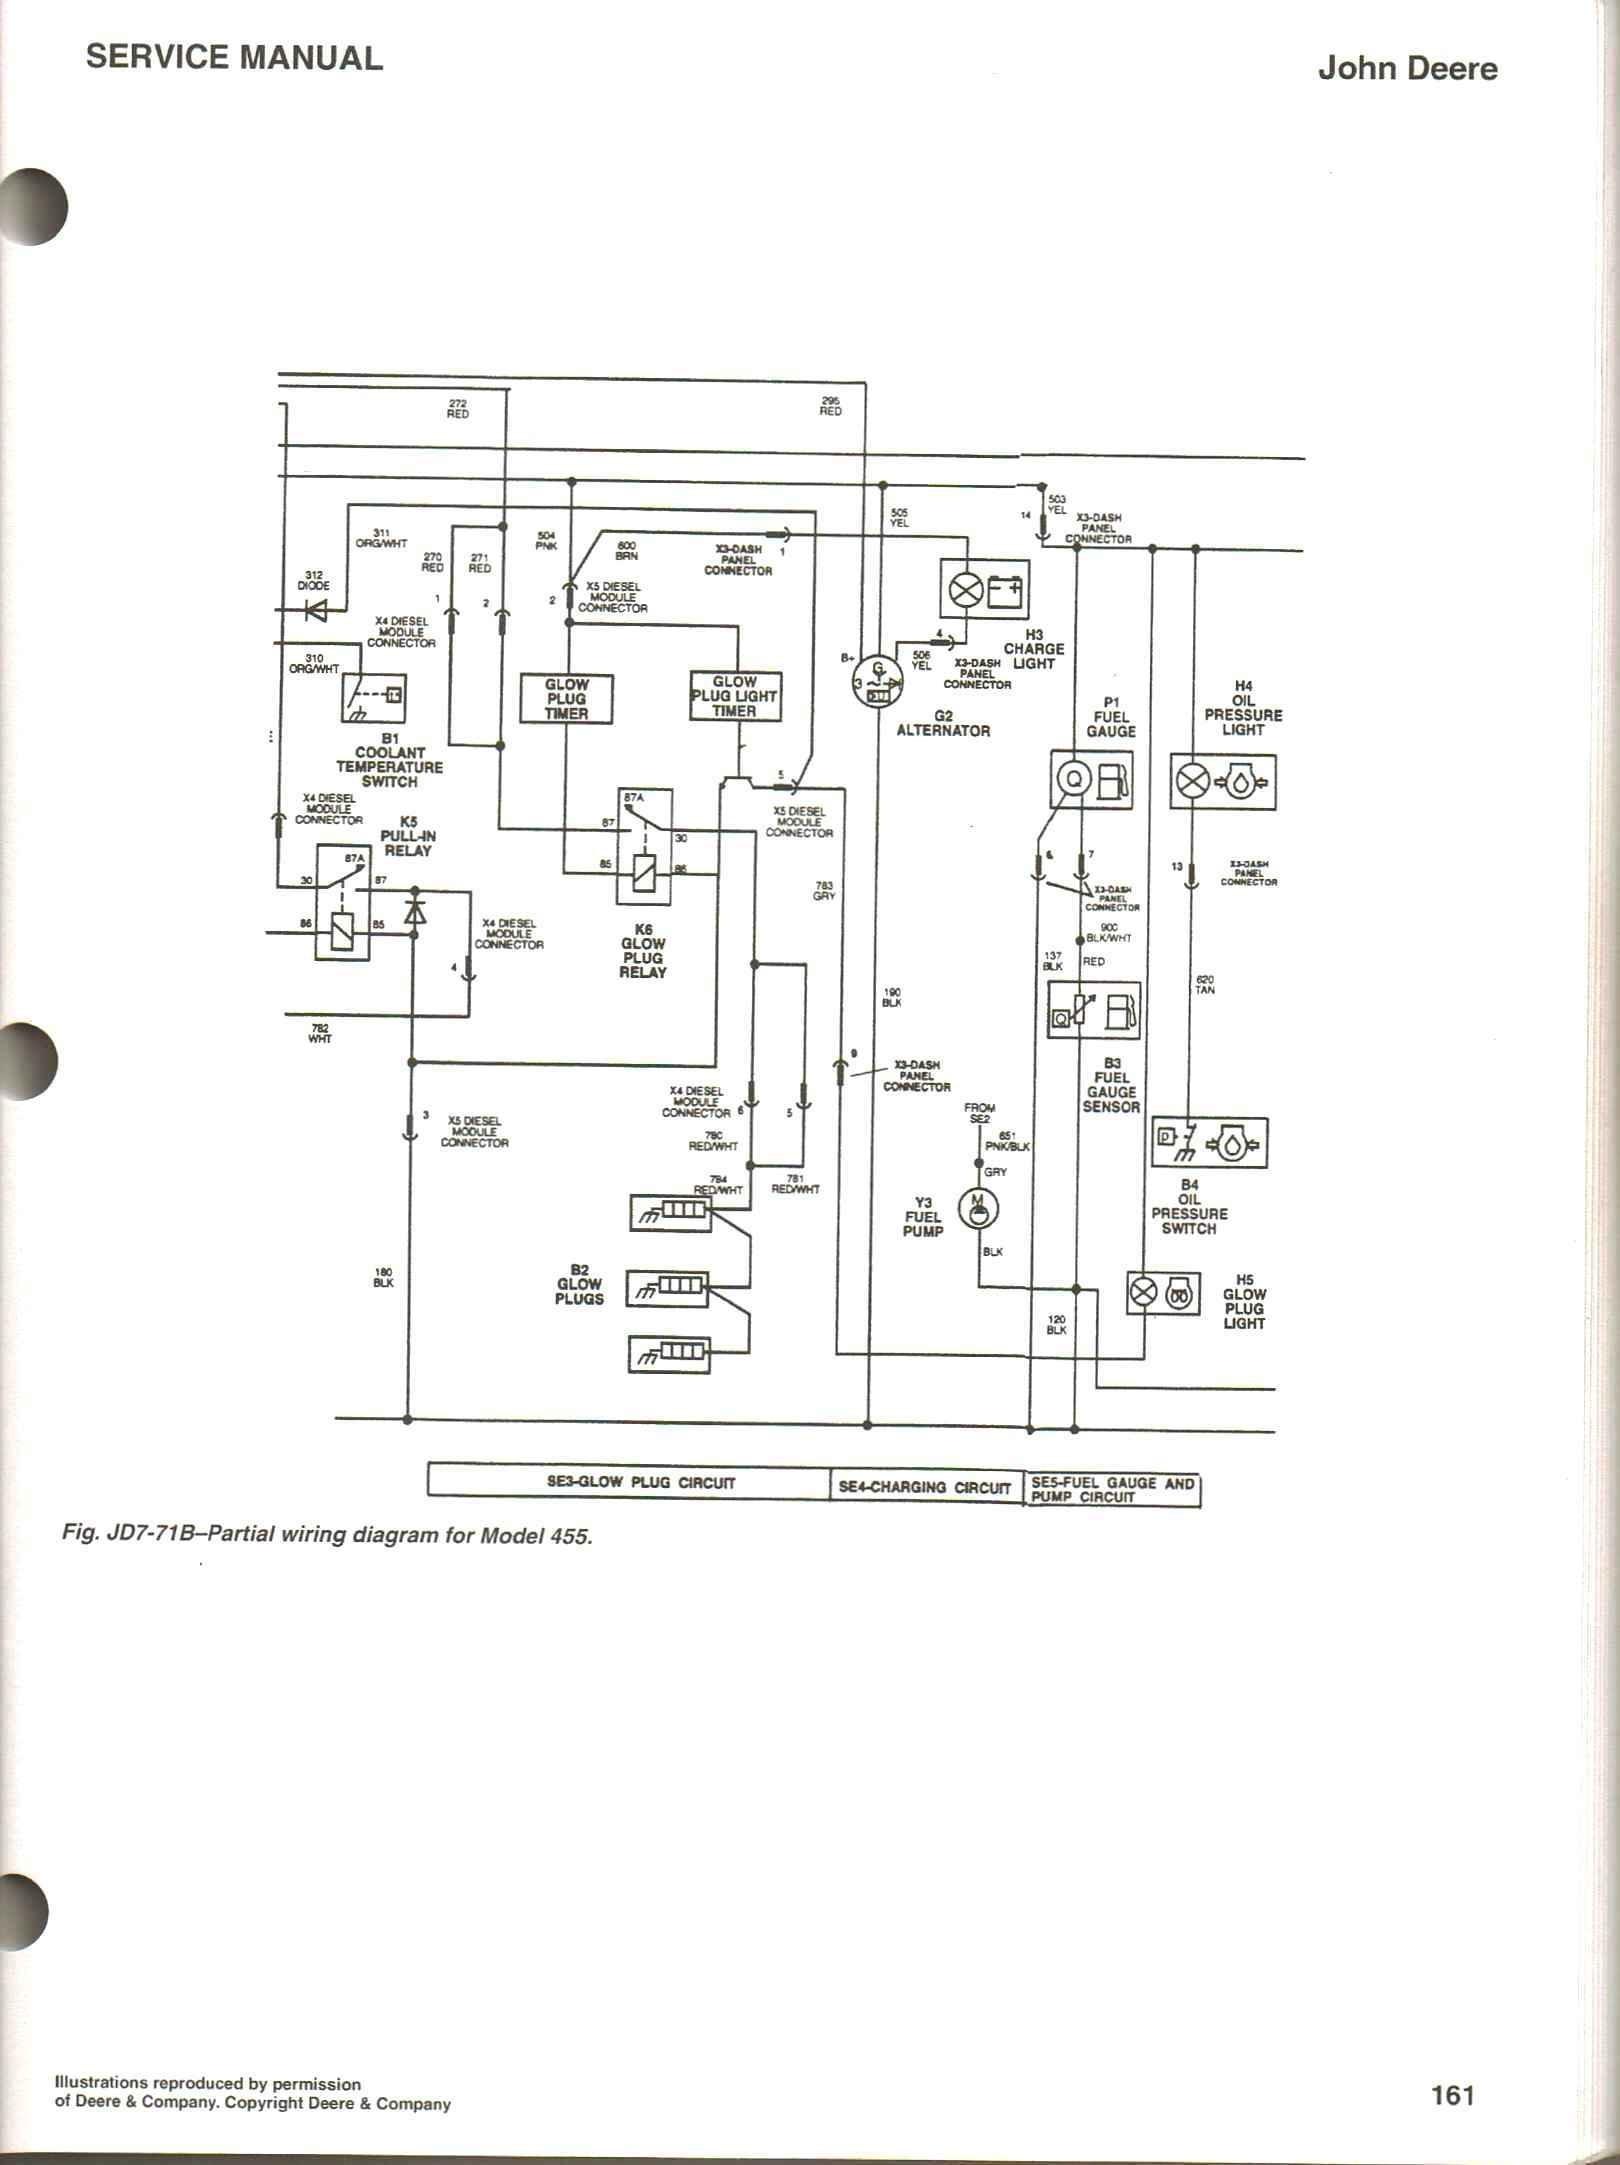 john deere gator 6x4 wiring diagram wiring diagram for john deere gator 6x4 save ausgezeichnet gator 6x4 seldiagramm fotos schaltplan serie 16h